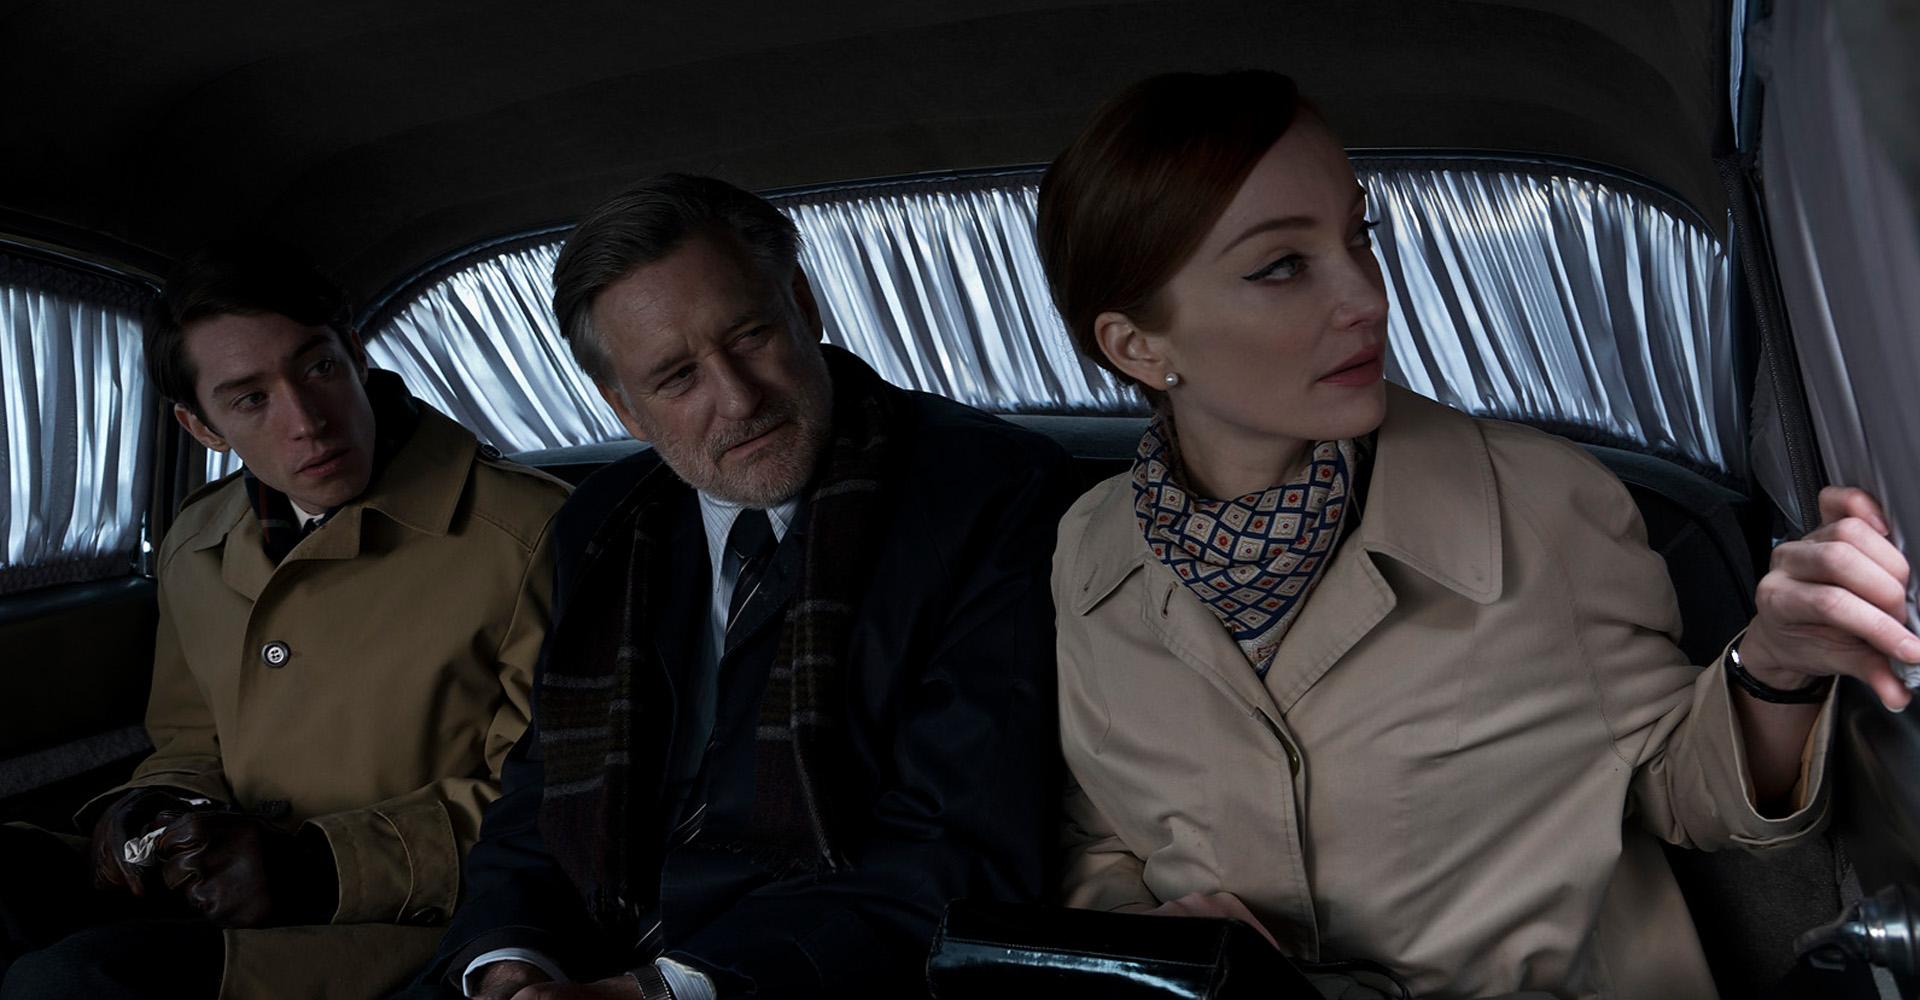 Lotte Verbeek, Bill Pullman und James Bloor in The Coldest Game